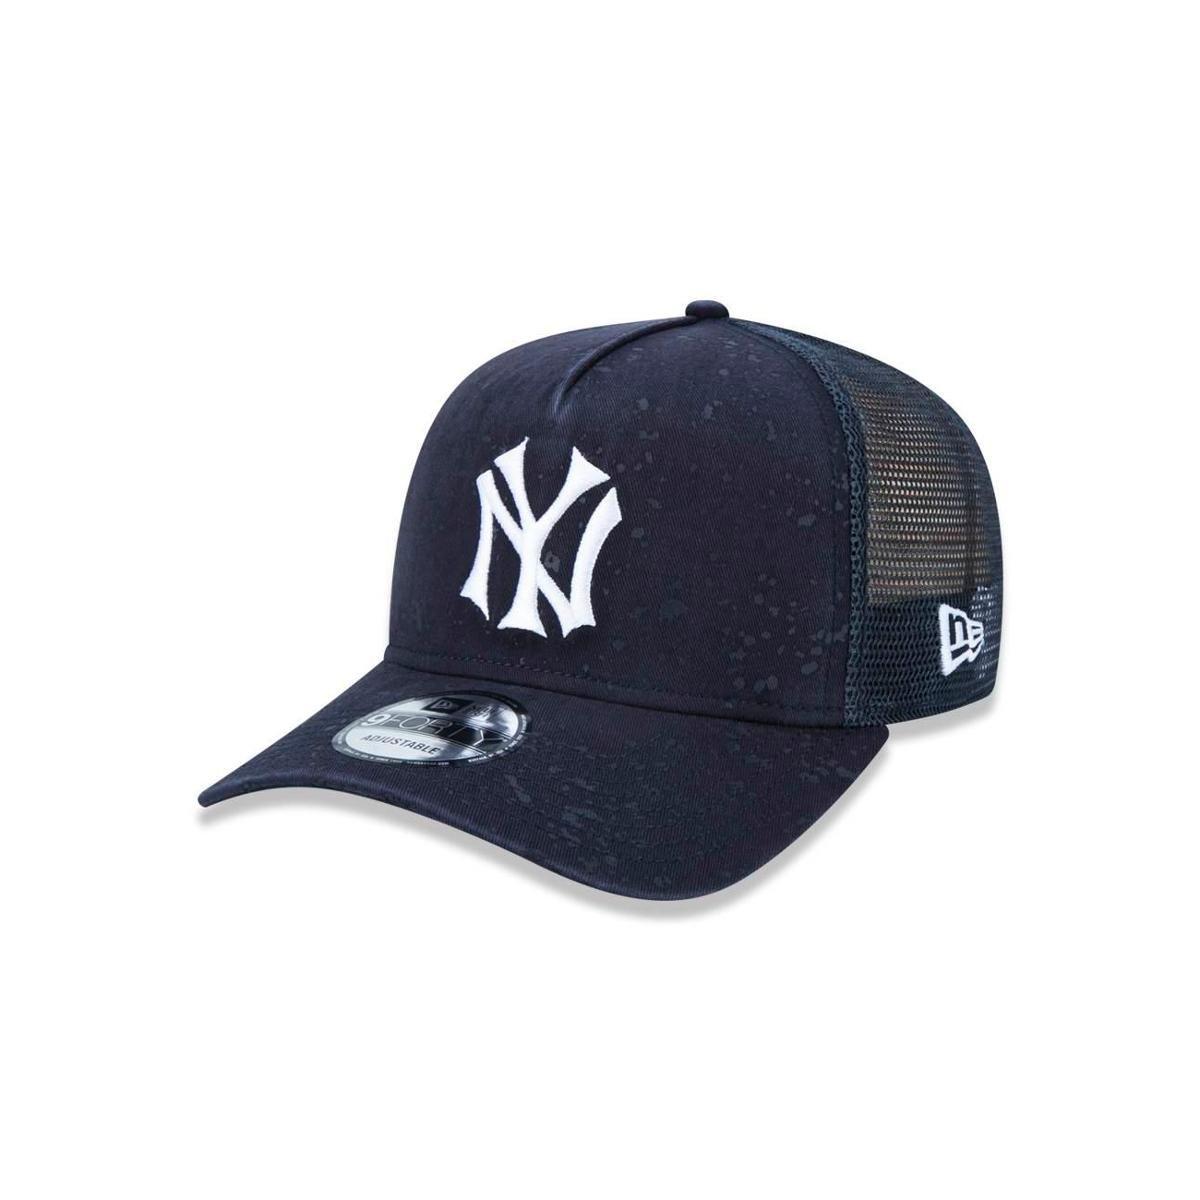 Bone 940 New York Yankees MLB Aba Reta Marinho New Era - Compre Agora  b534f3d9260